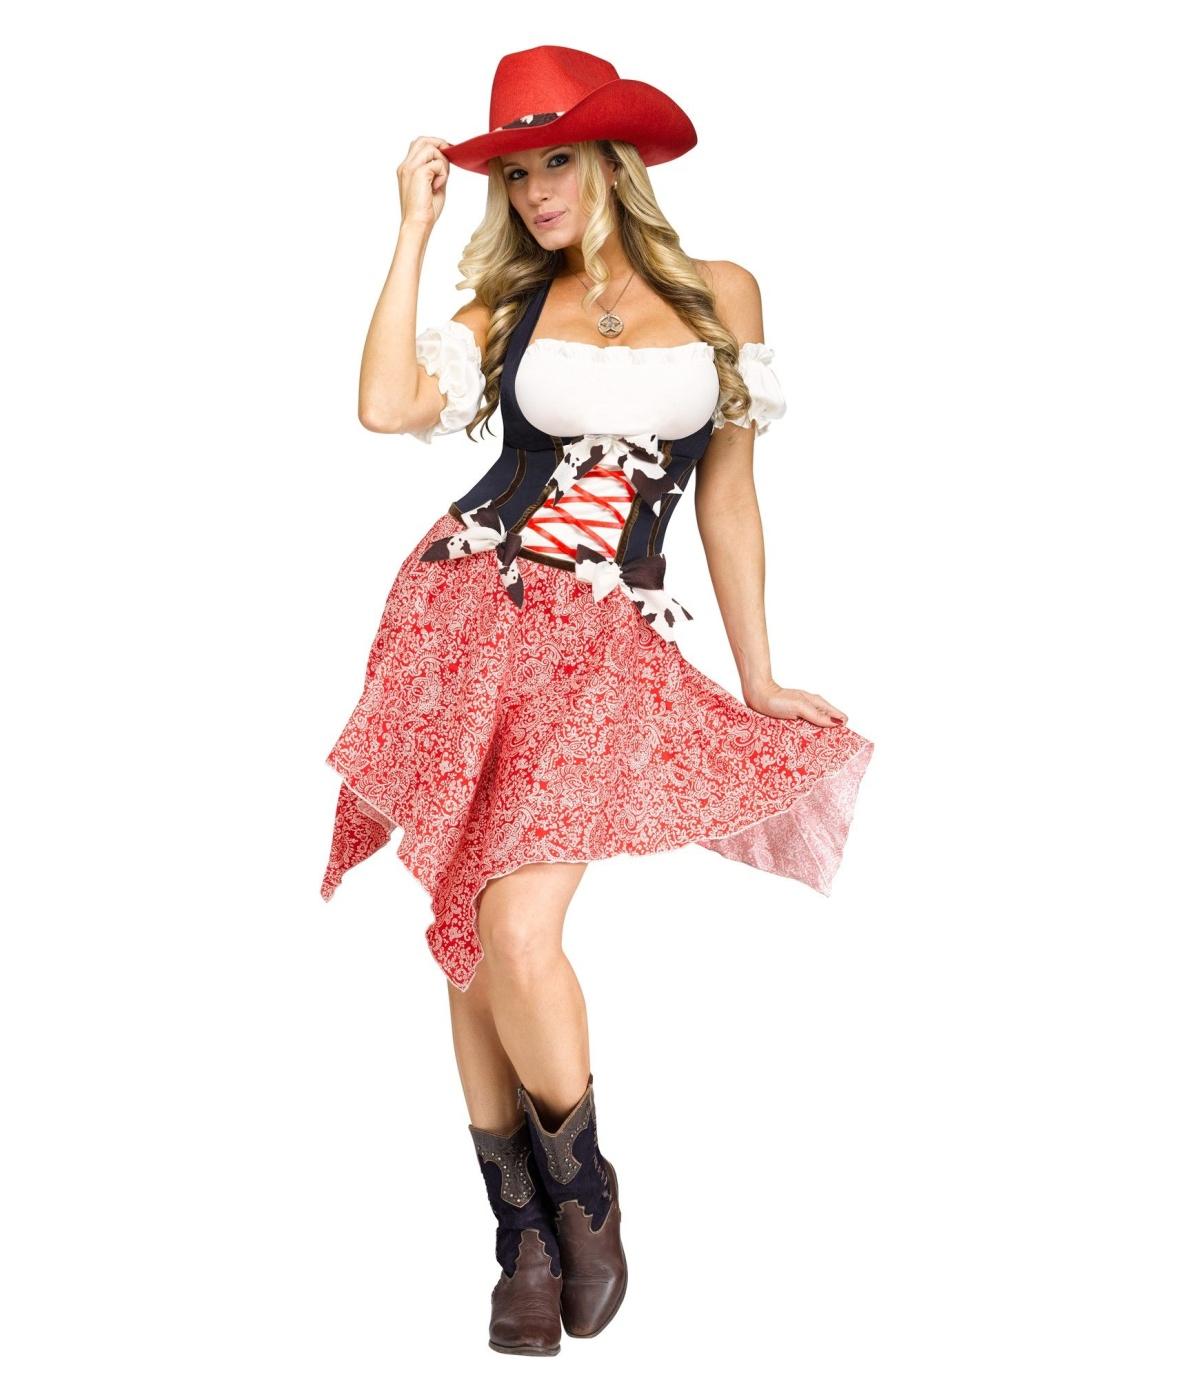 sc 1 st  Halloween Costumes & Hoedown Hottie Womens Costume - Sexy Costume